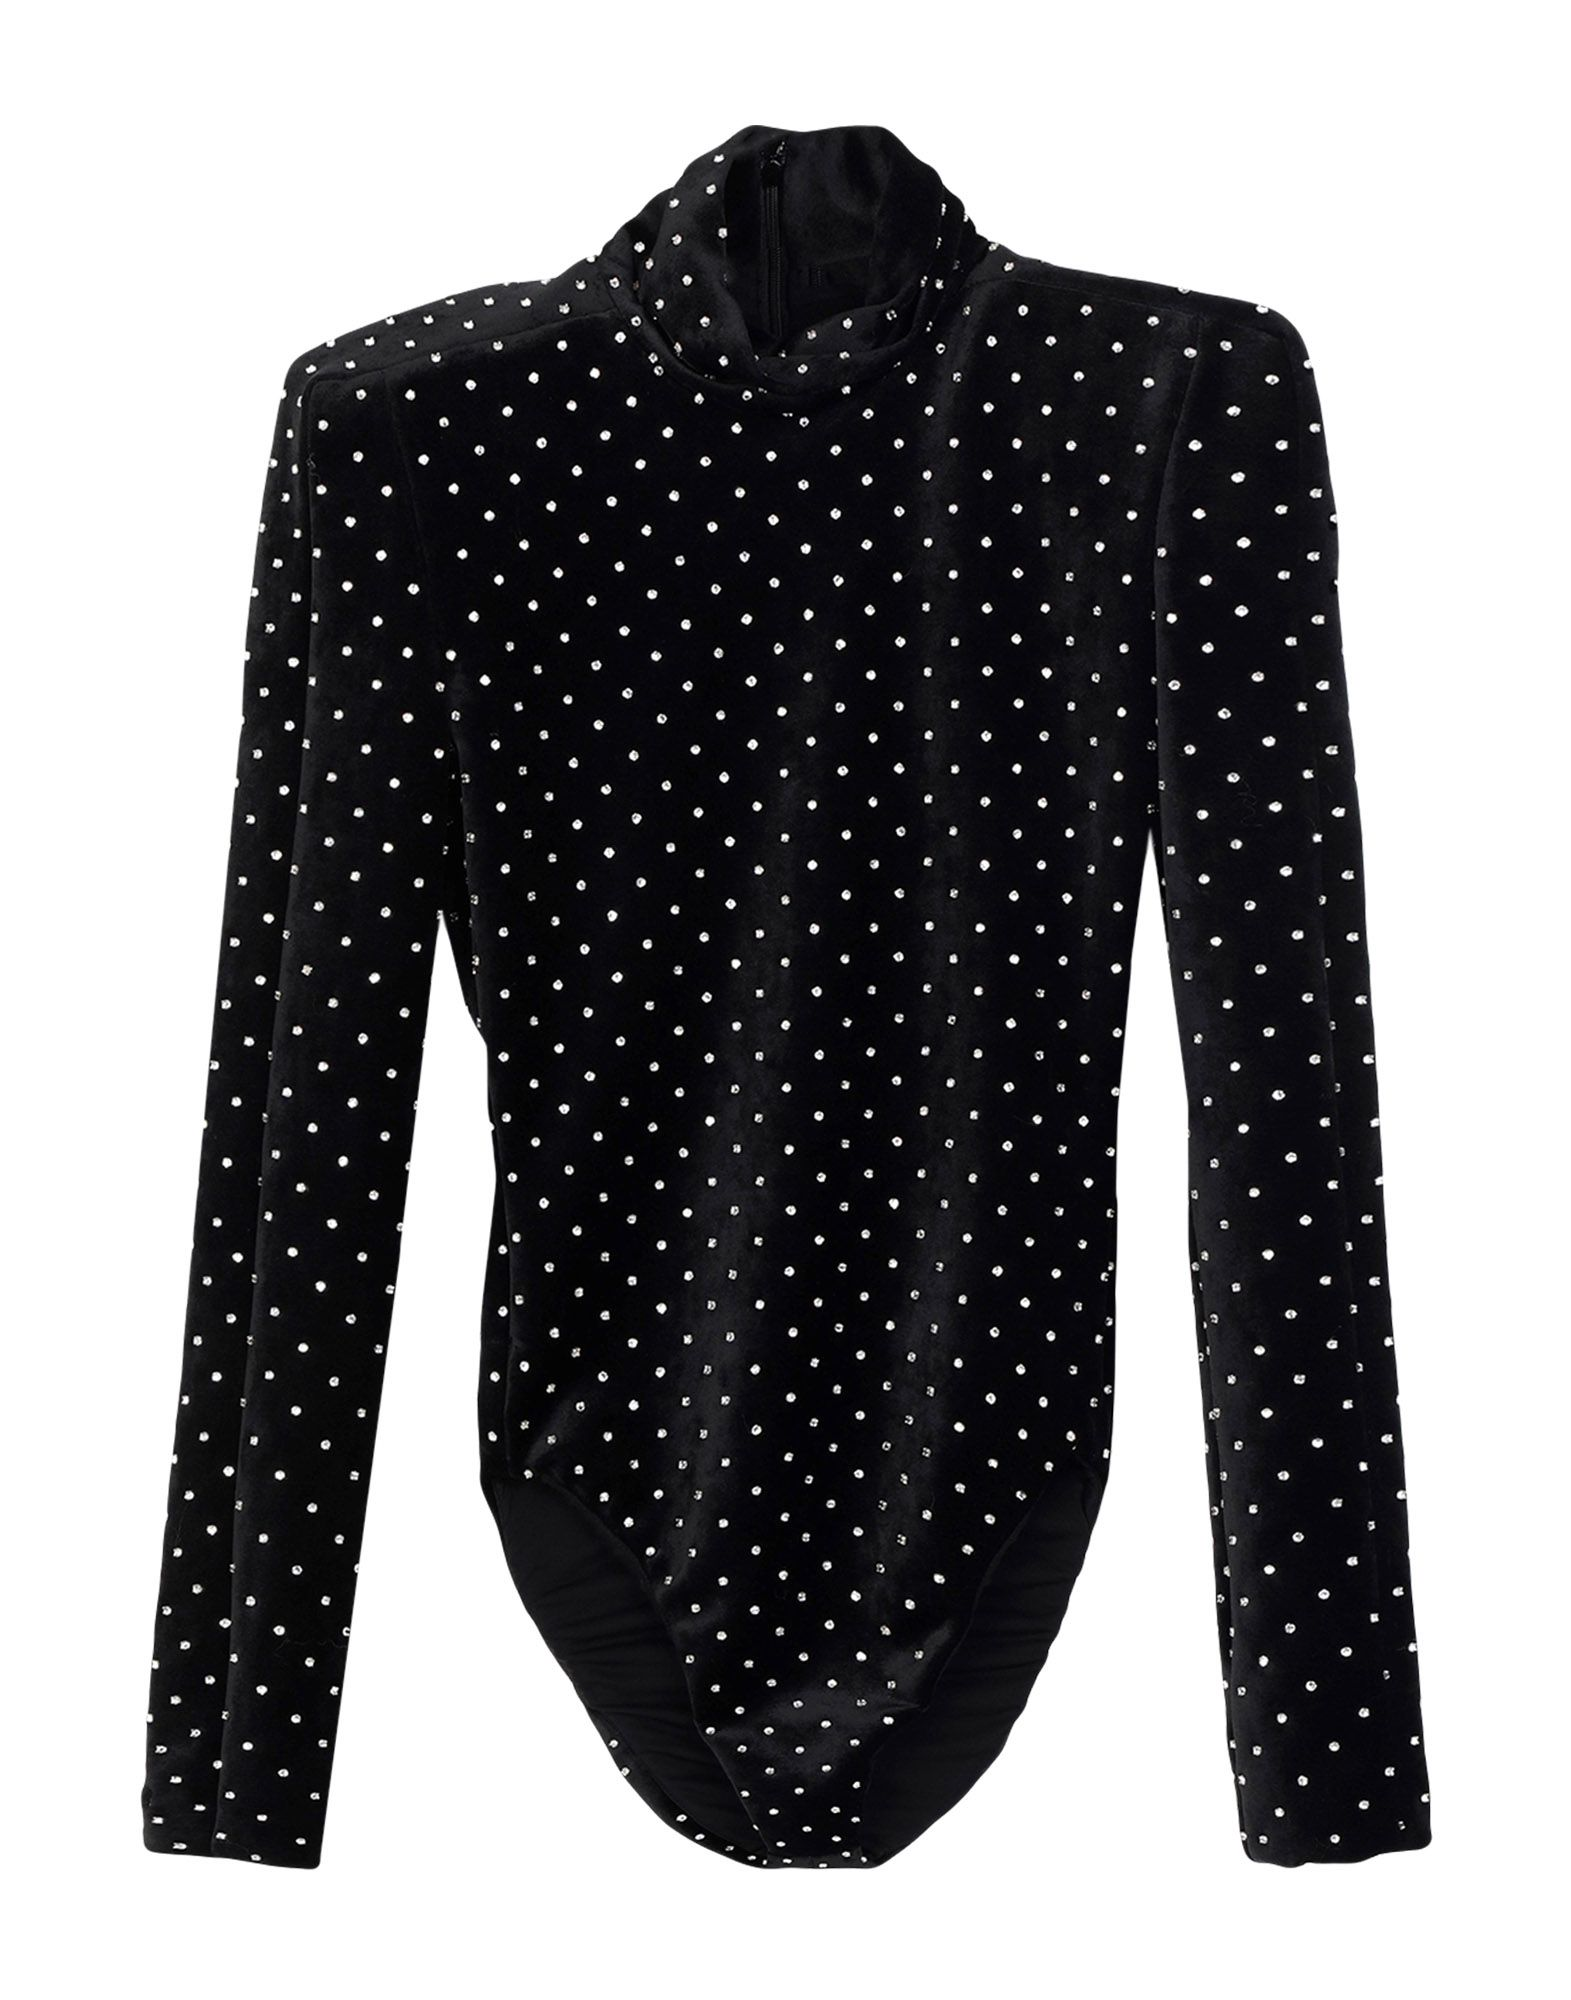 velvet, rhinestones, solid color, rear closure, zip, long sleeves, turtleneck, no pockets, crotch of